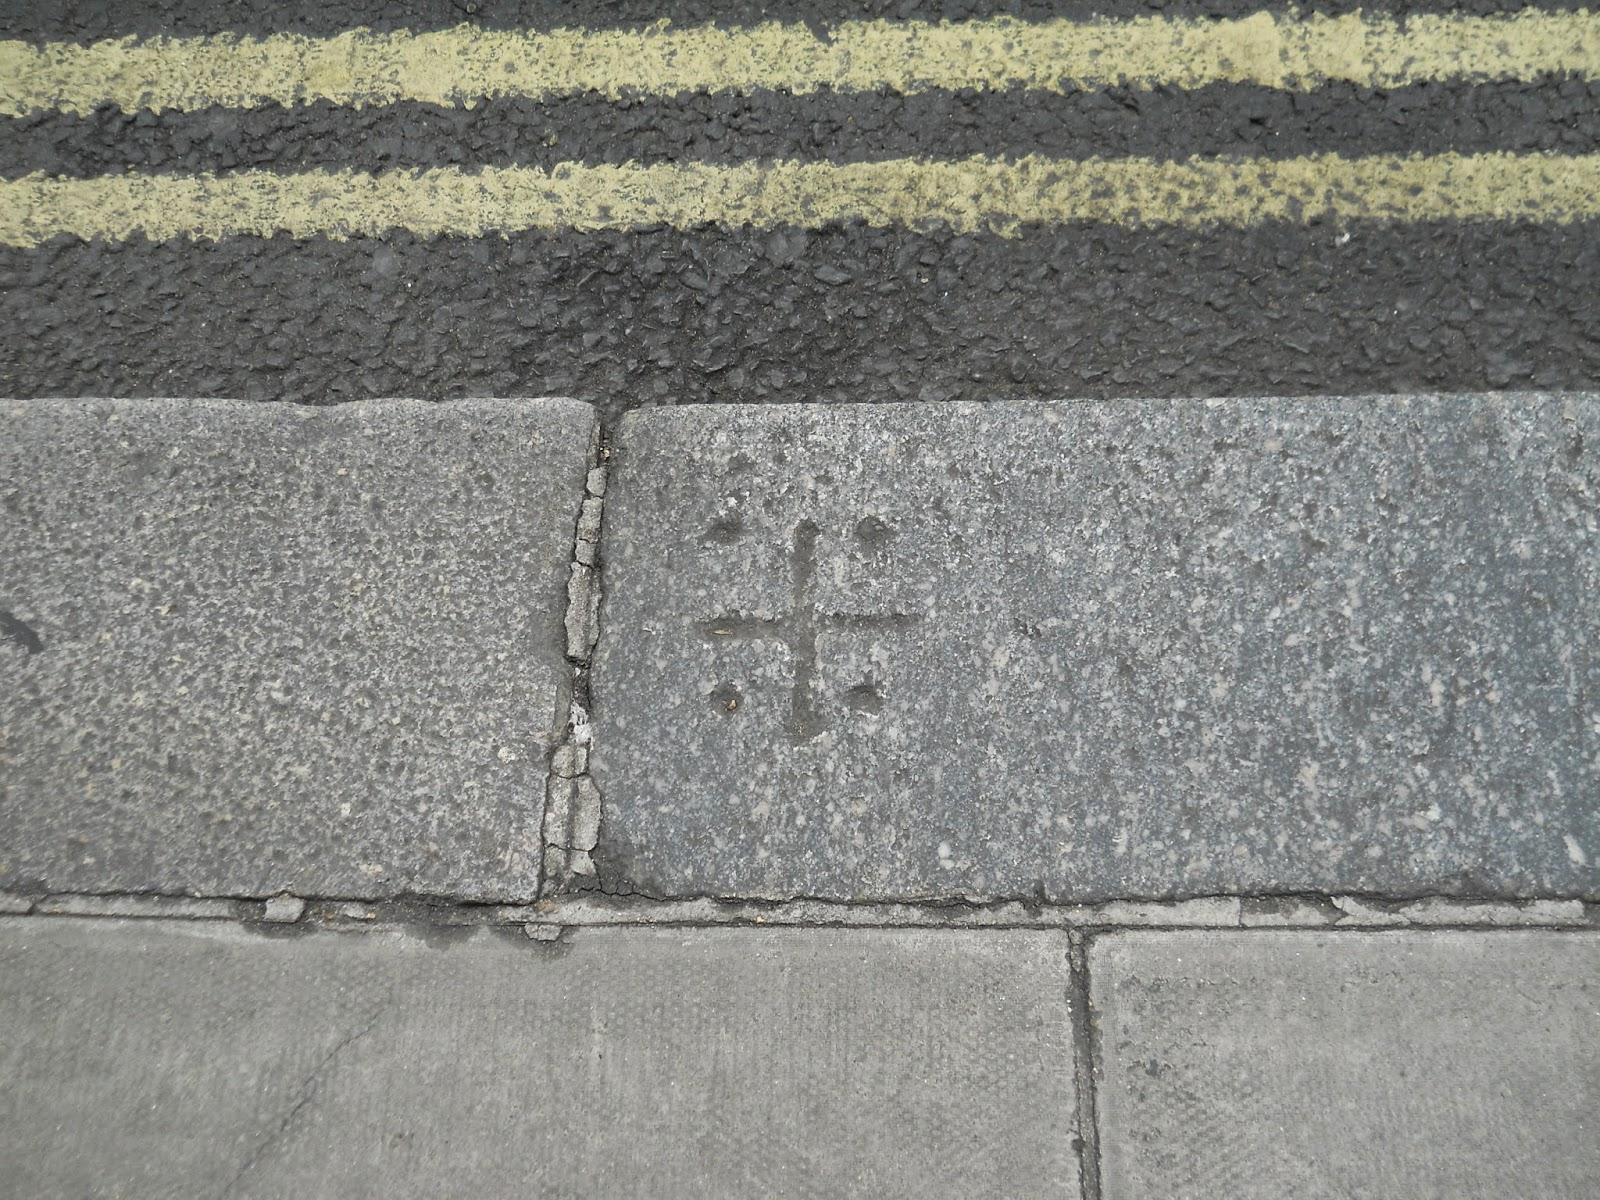 kerbstone symbol